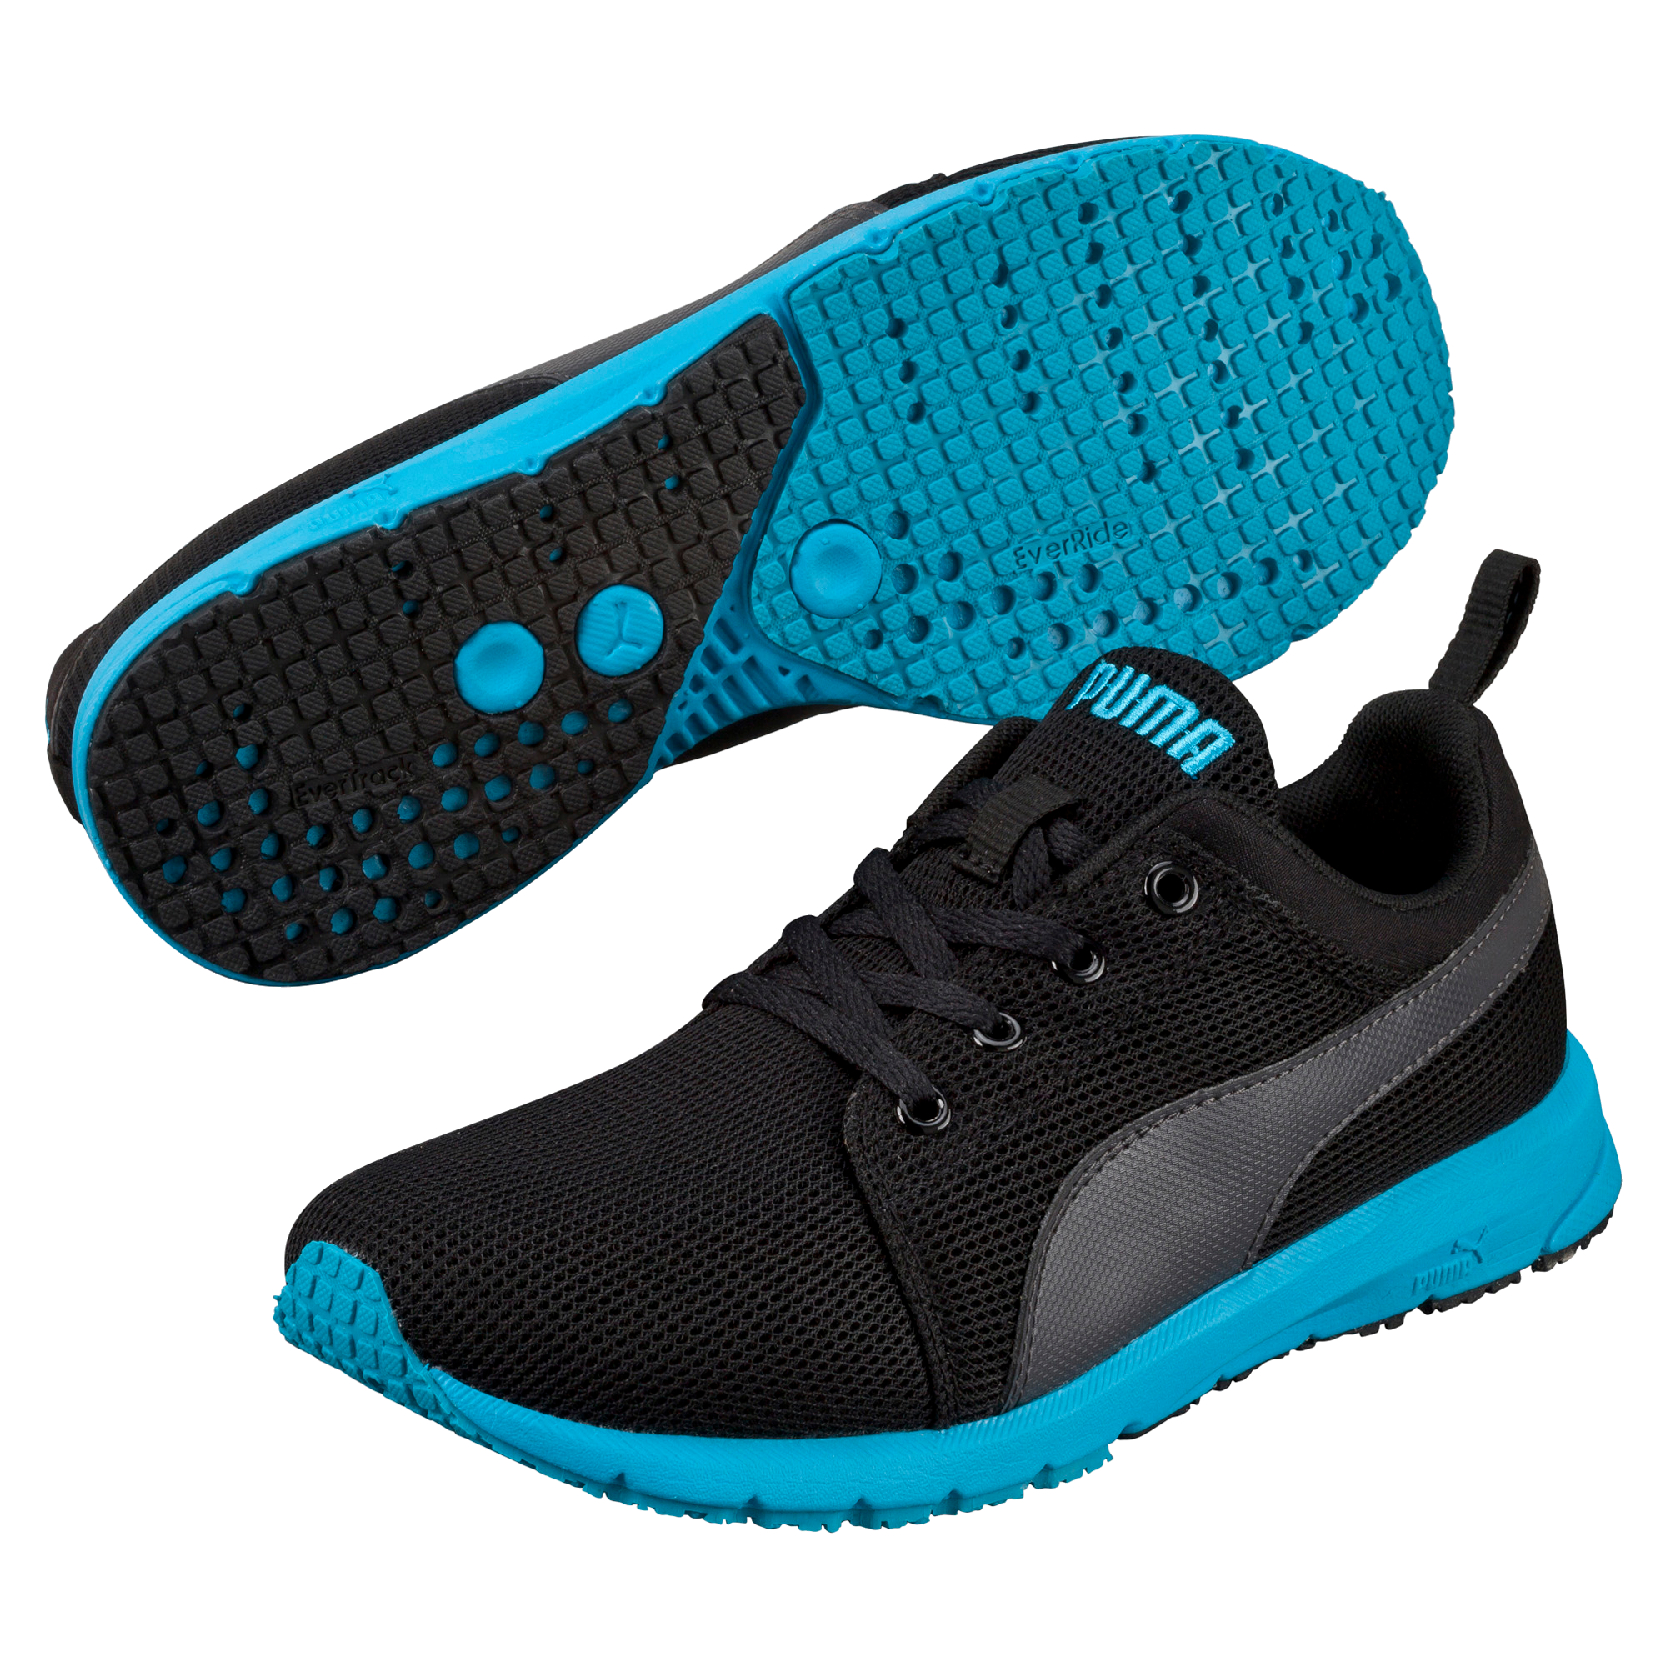 Puma Chlapčenské bežecké tenisky Carson Runner JR - modro-čierne ... 0a2838dd89f